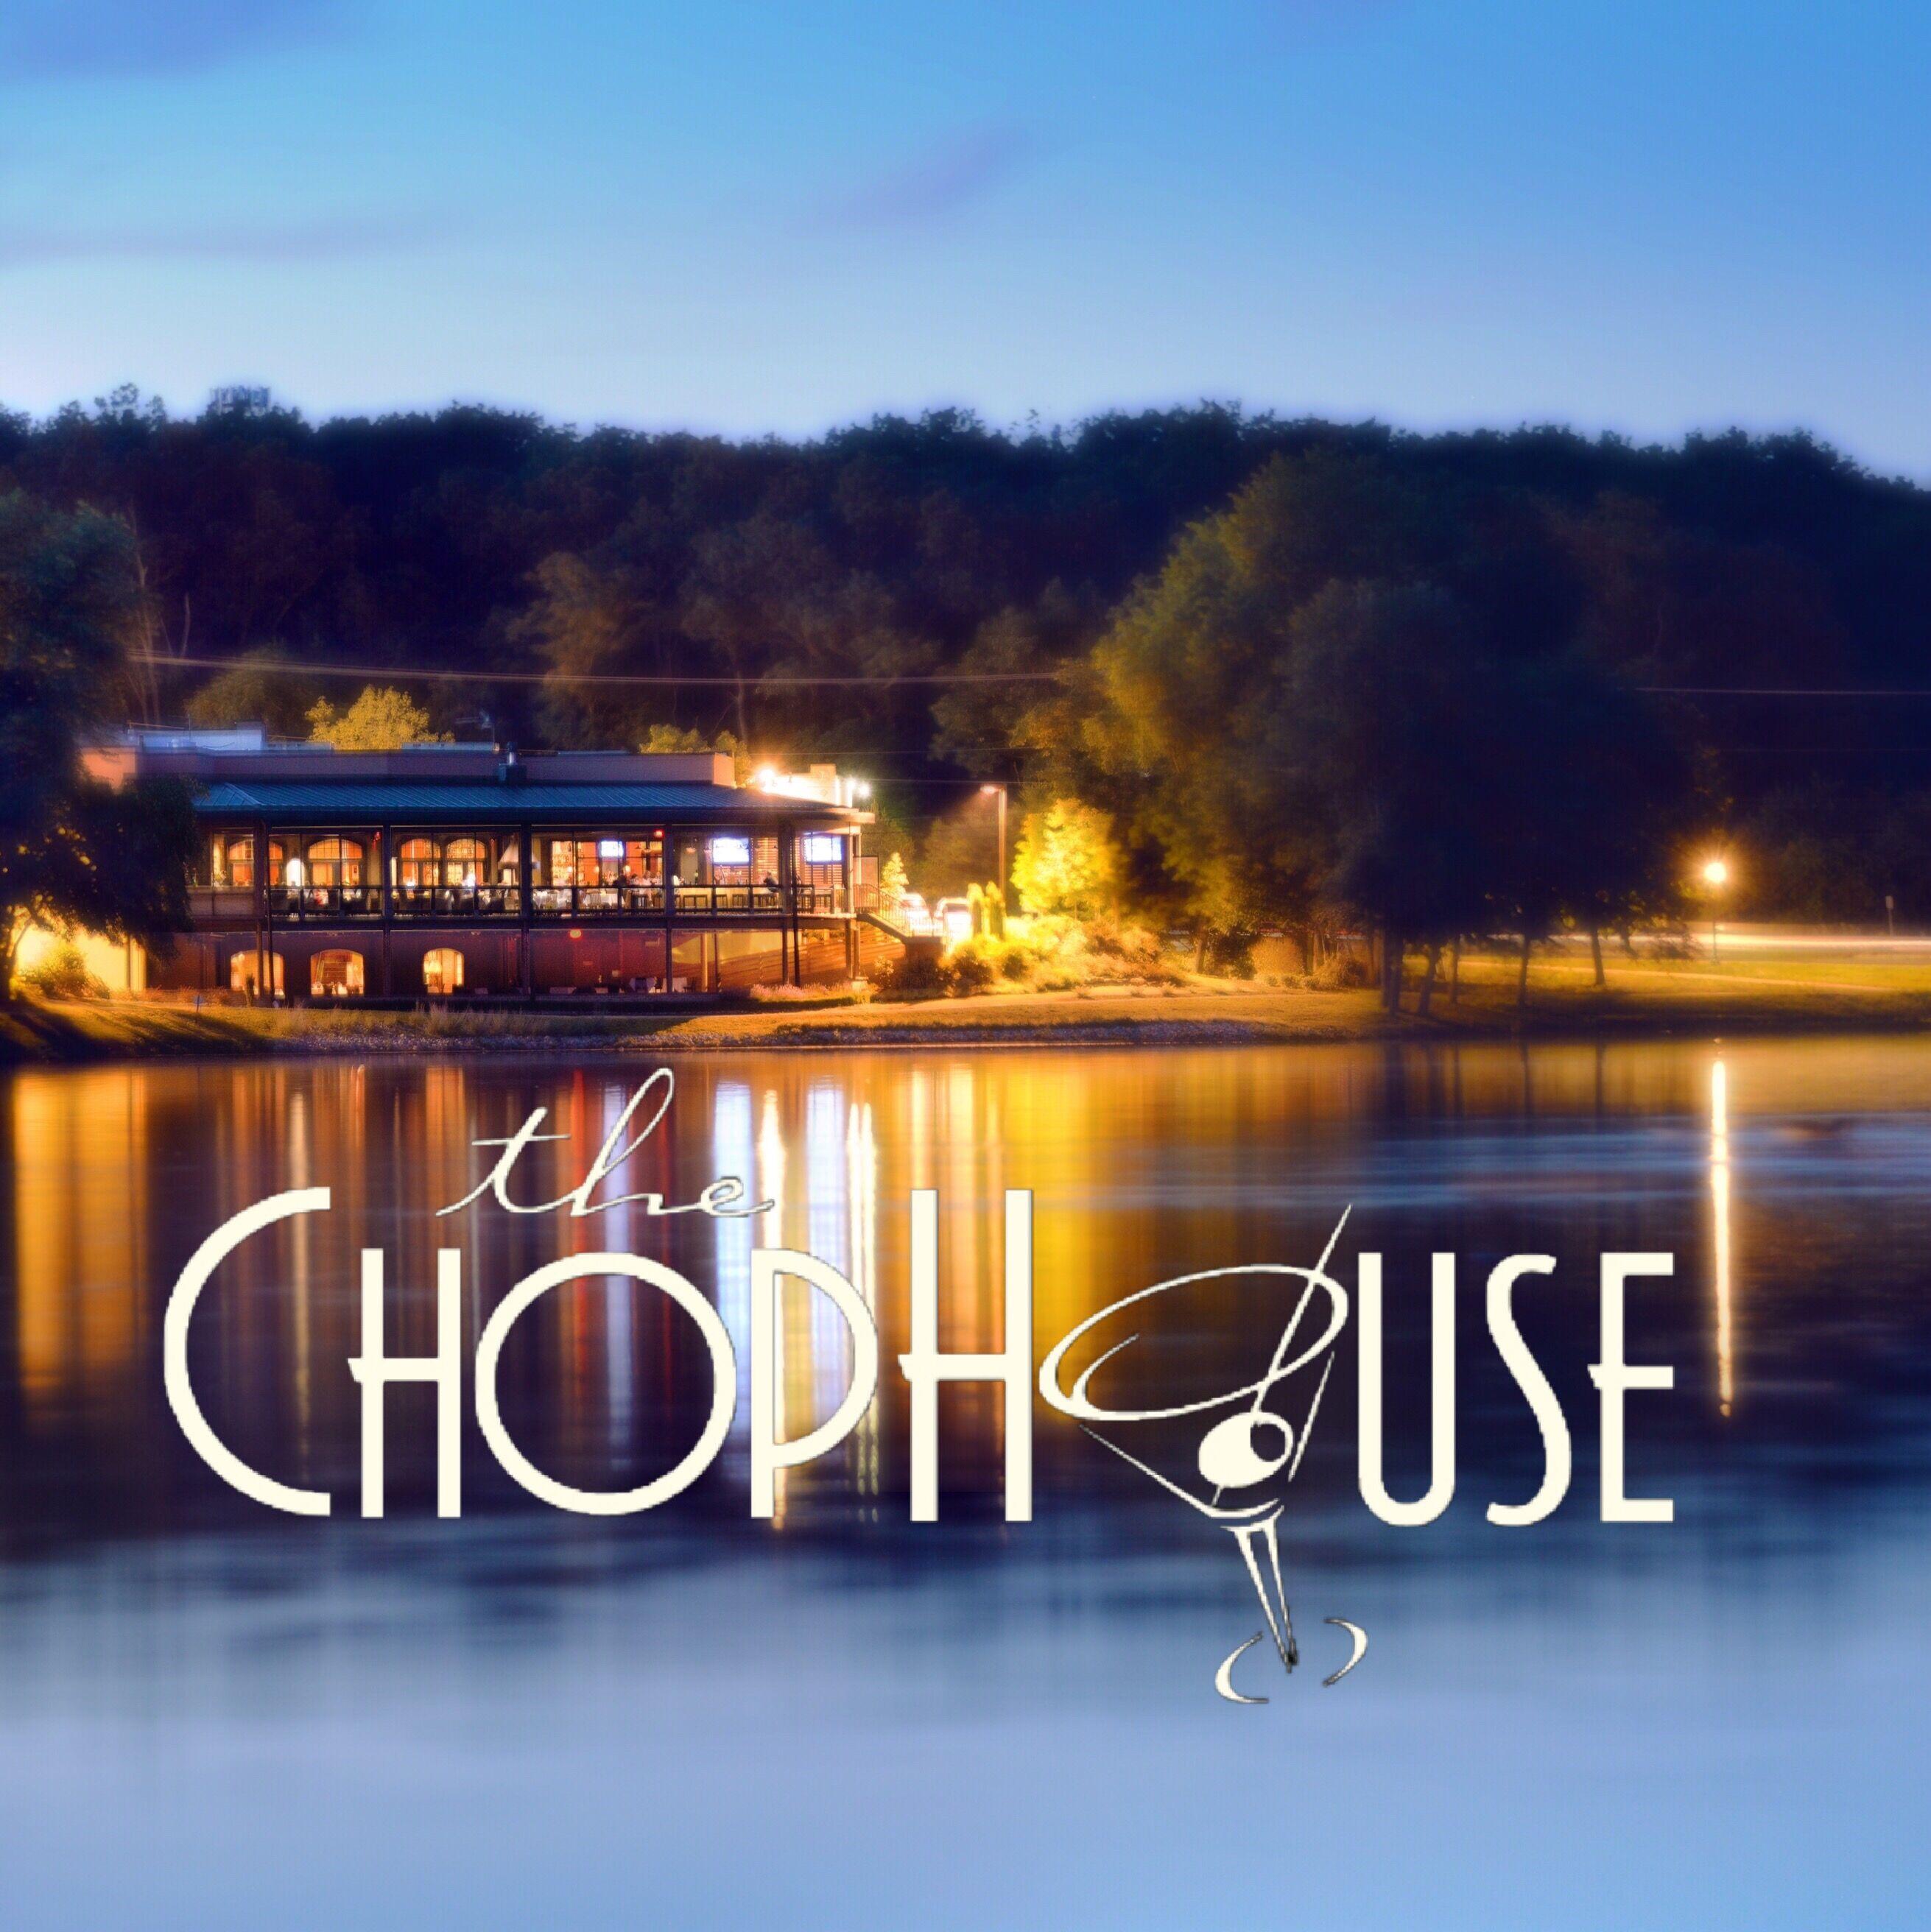 The chop house gibbsboro nj - Small mens hoodies